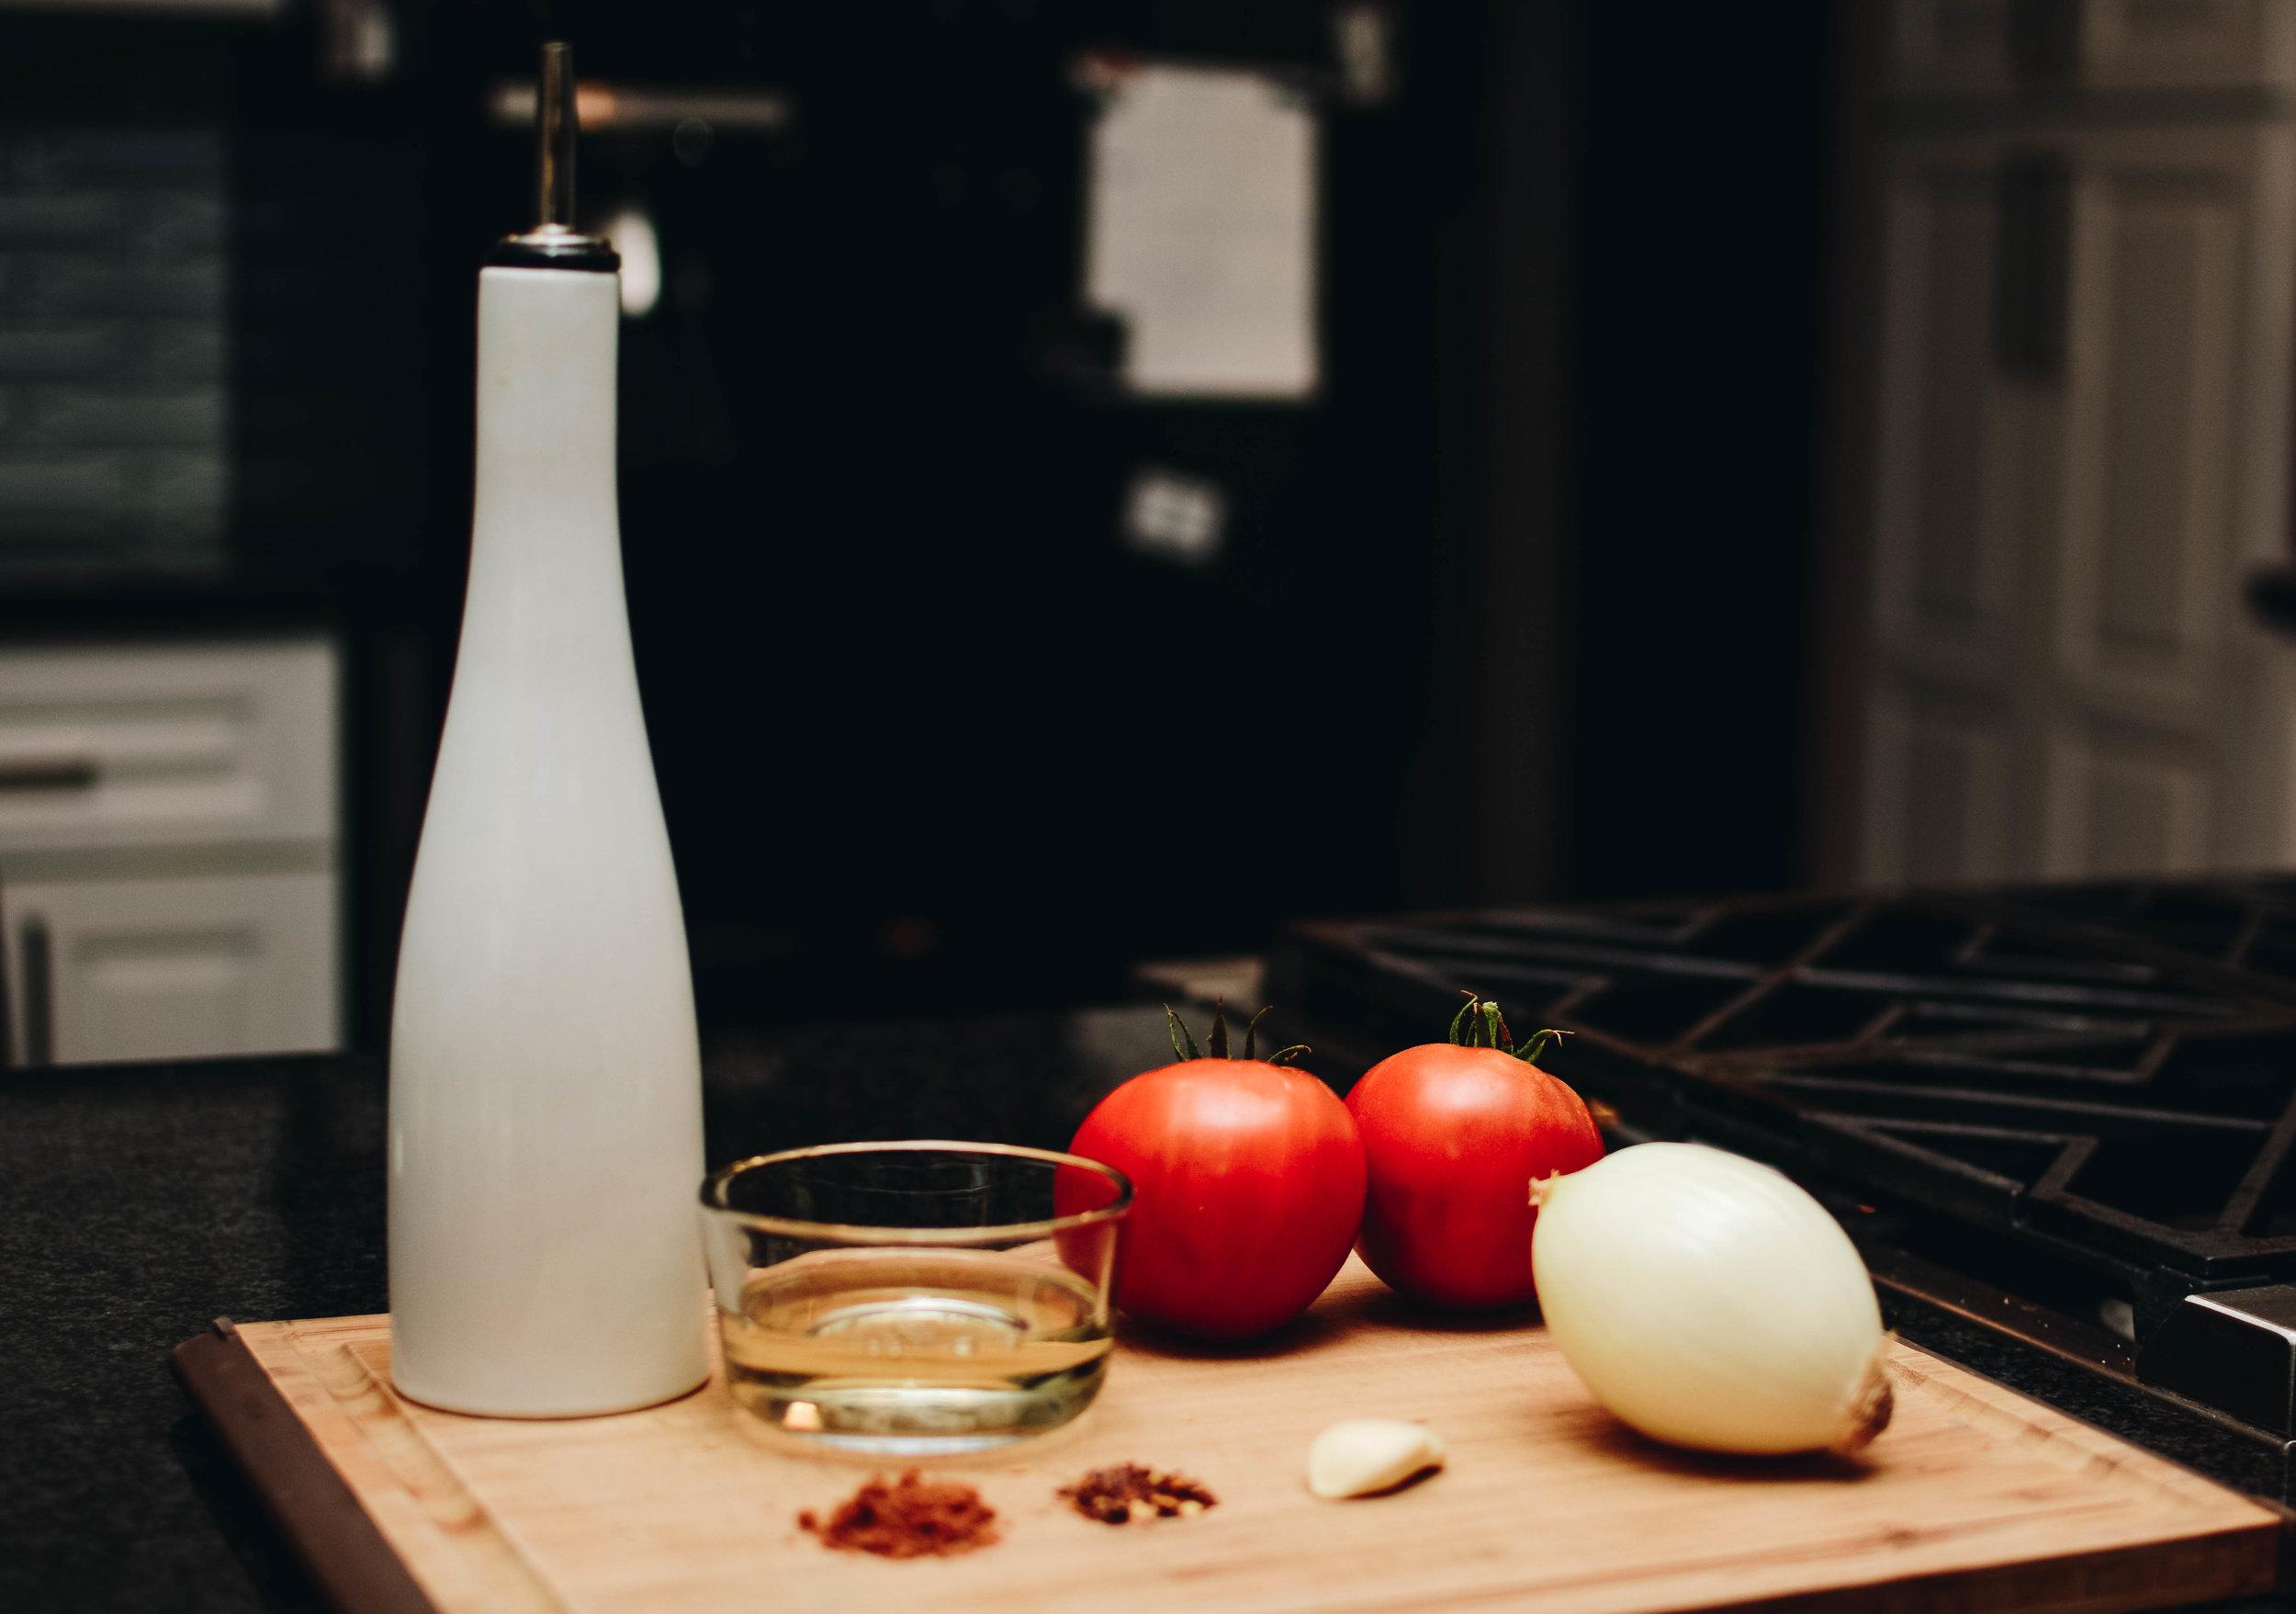 tomato onion wine